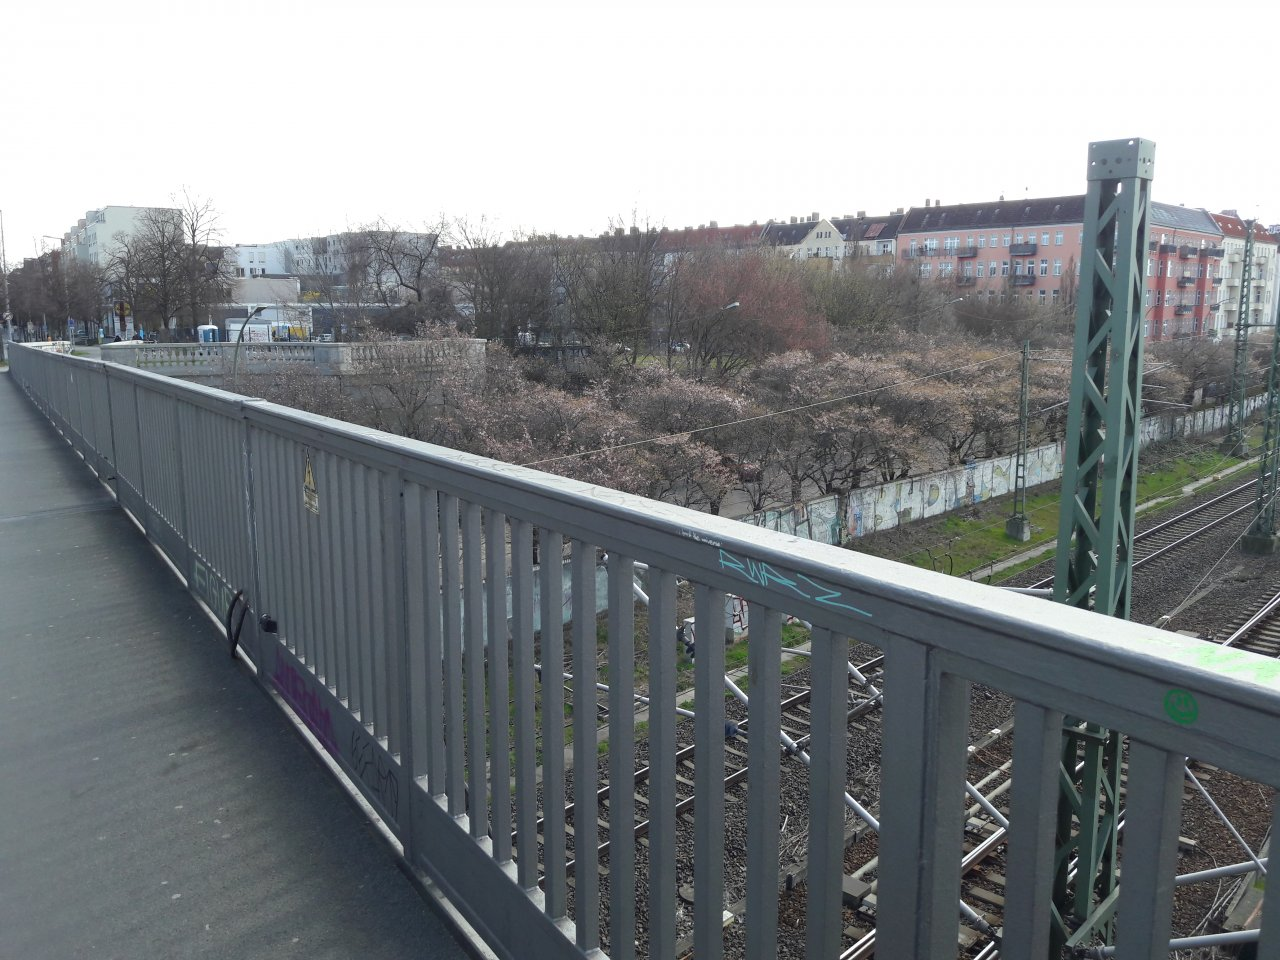 Neubauareal-Bornholmer-Strasse.jpg